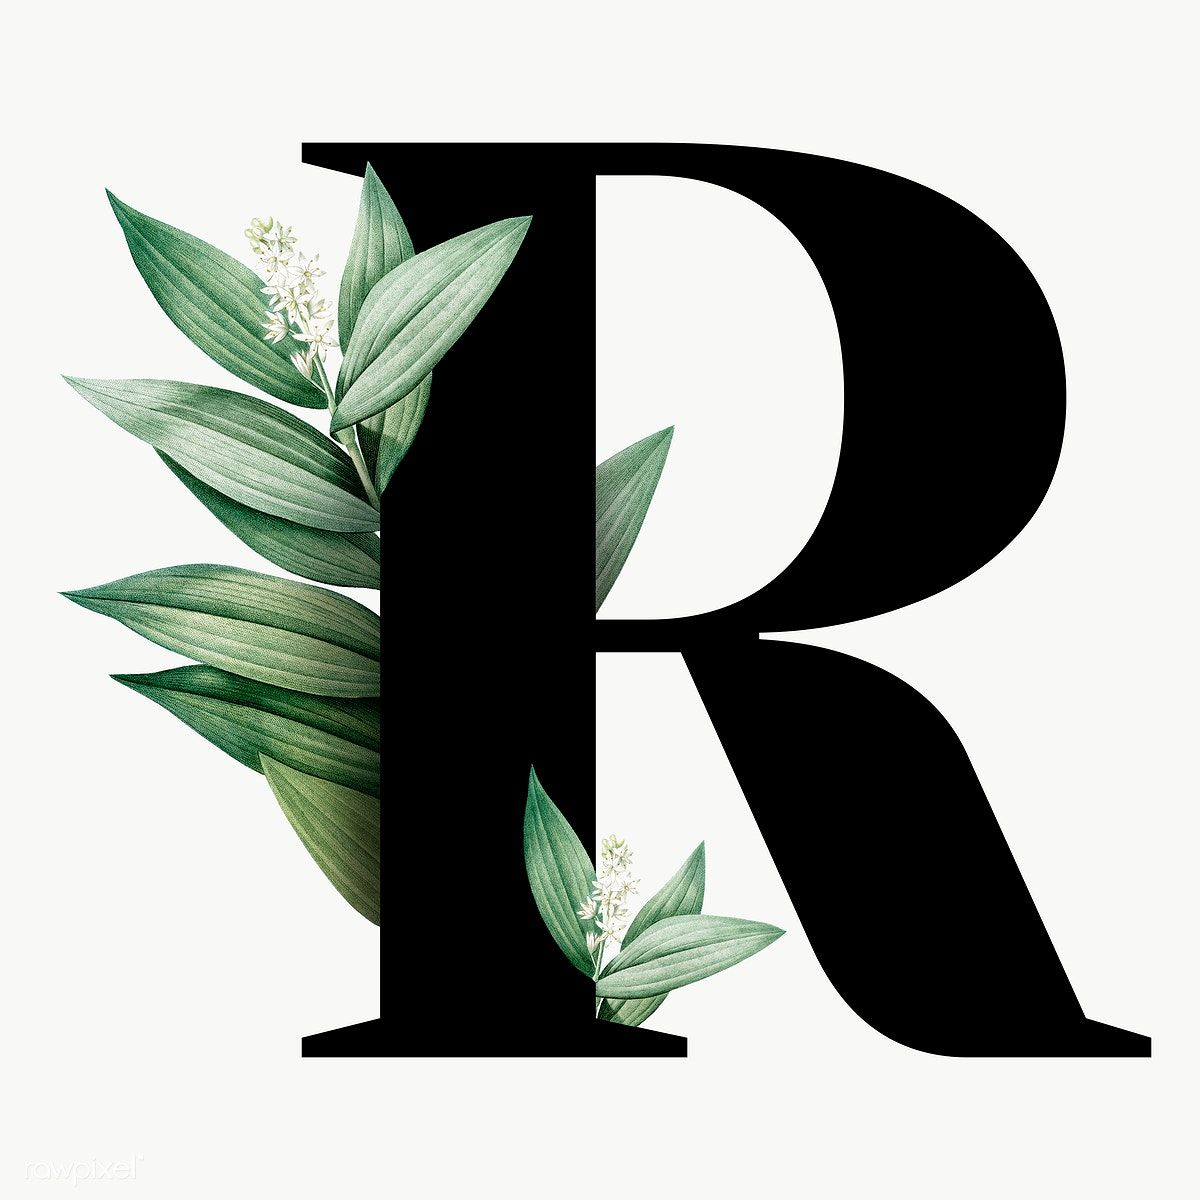 Botanical Capital Letter R Transparent Png Premium Image By Rawpixel Com Aum Lukisan Huruf Foto Abstrak Menggambar Kaktus